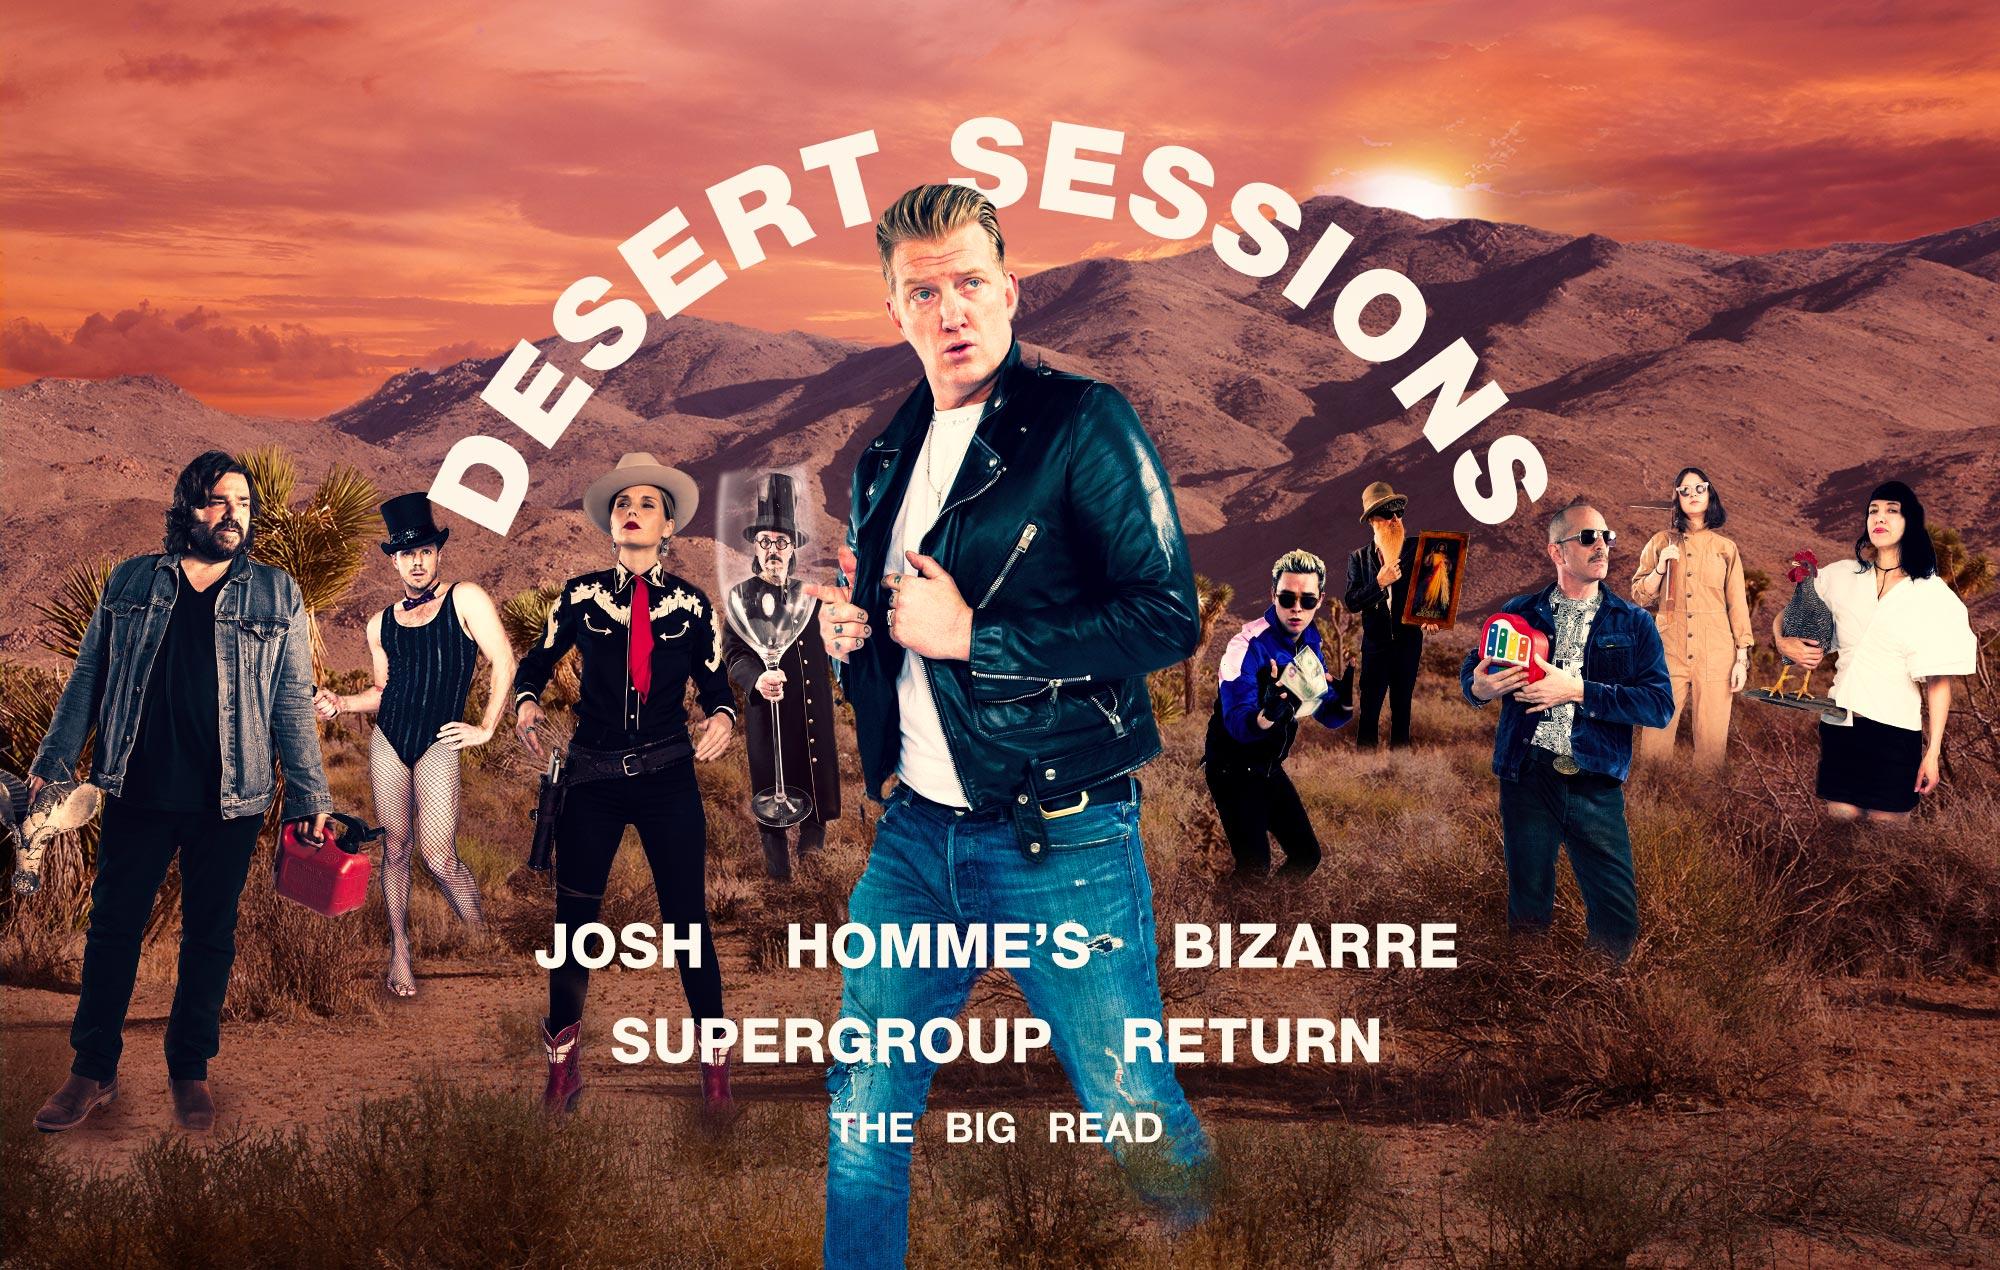 Desert Sessions interview Josh Homme